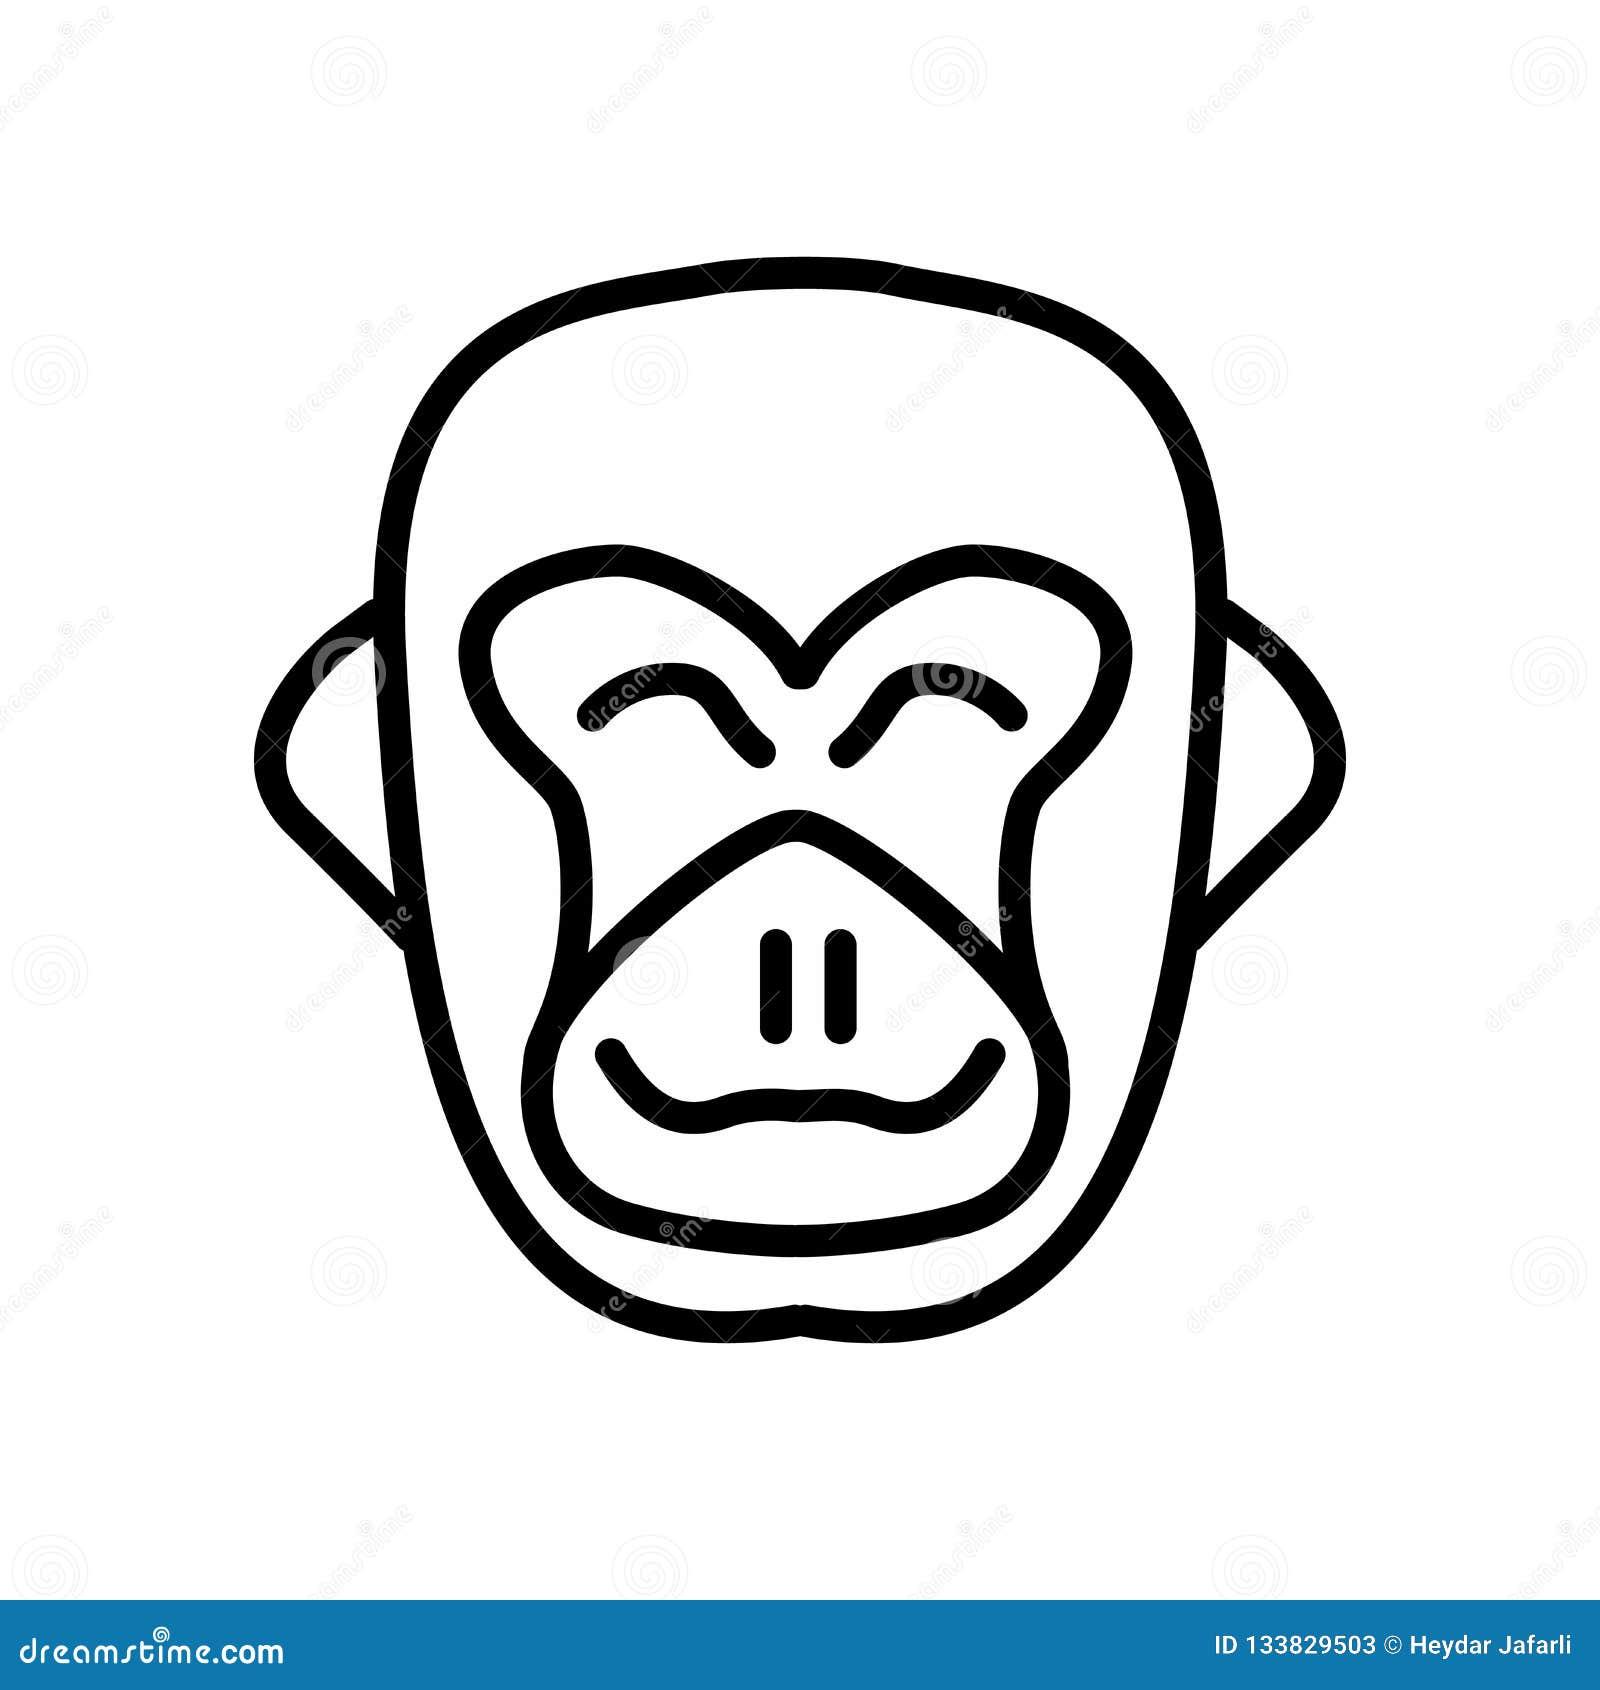 20334dea1 Gorilla icon vector isolated on white background, Gorilla transparent sign.  More similar stock illustrations